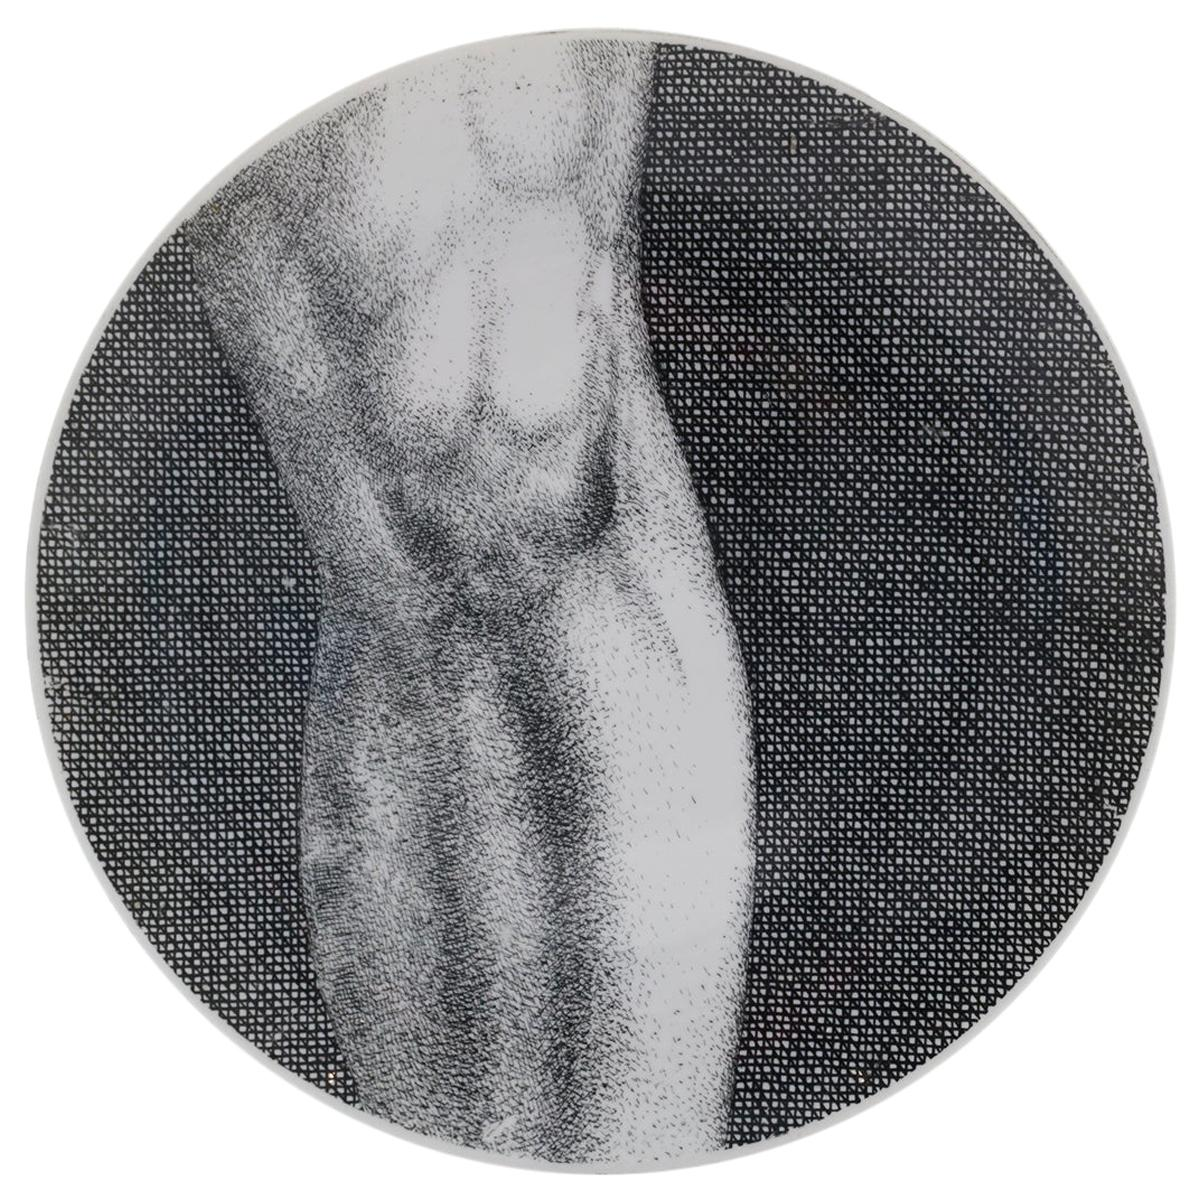 Piero Fornasetti Adamo or Adam Porcelain Plate # 4, Signed, Excellent Condition